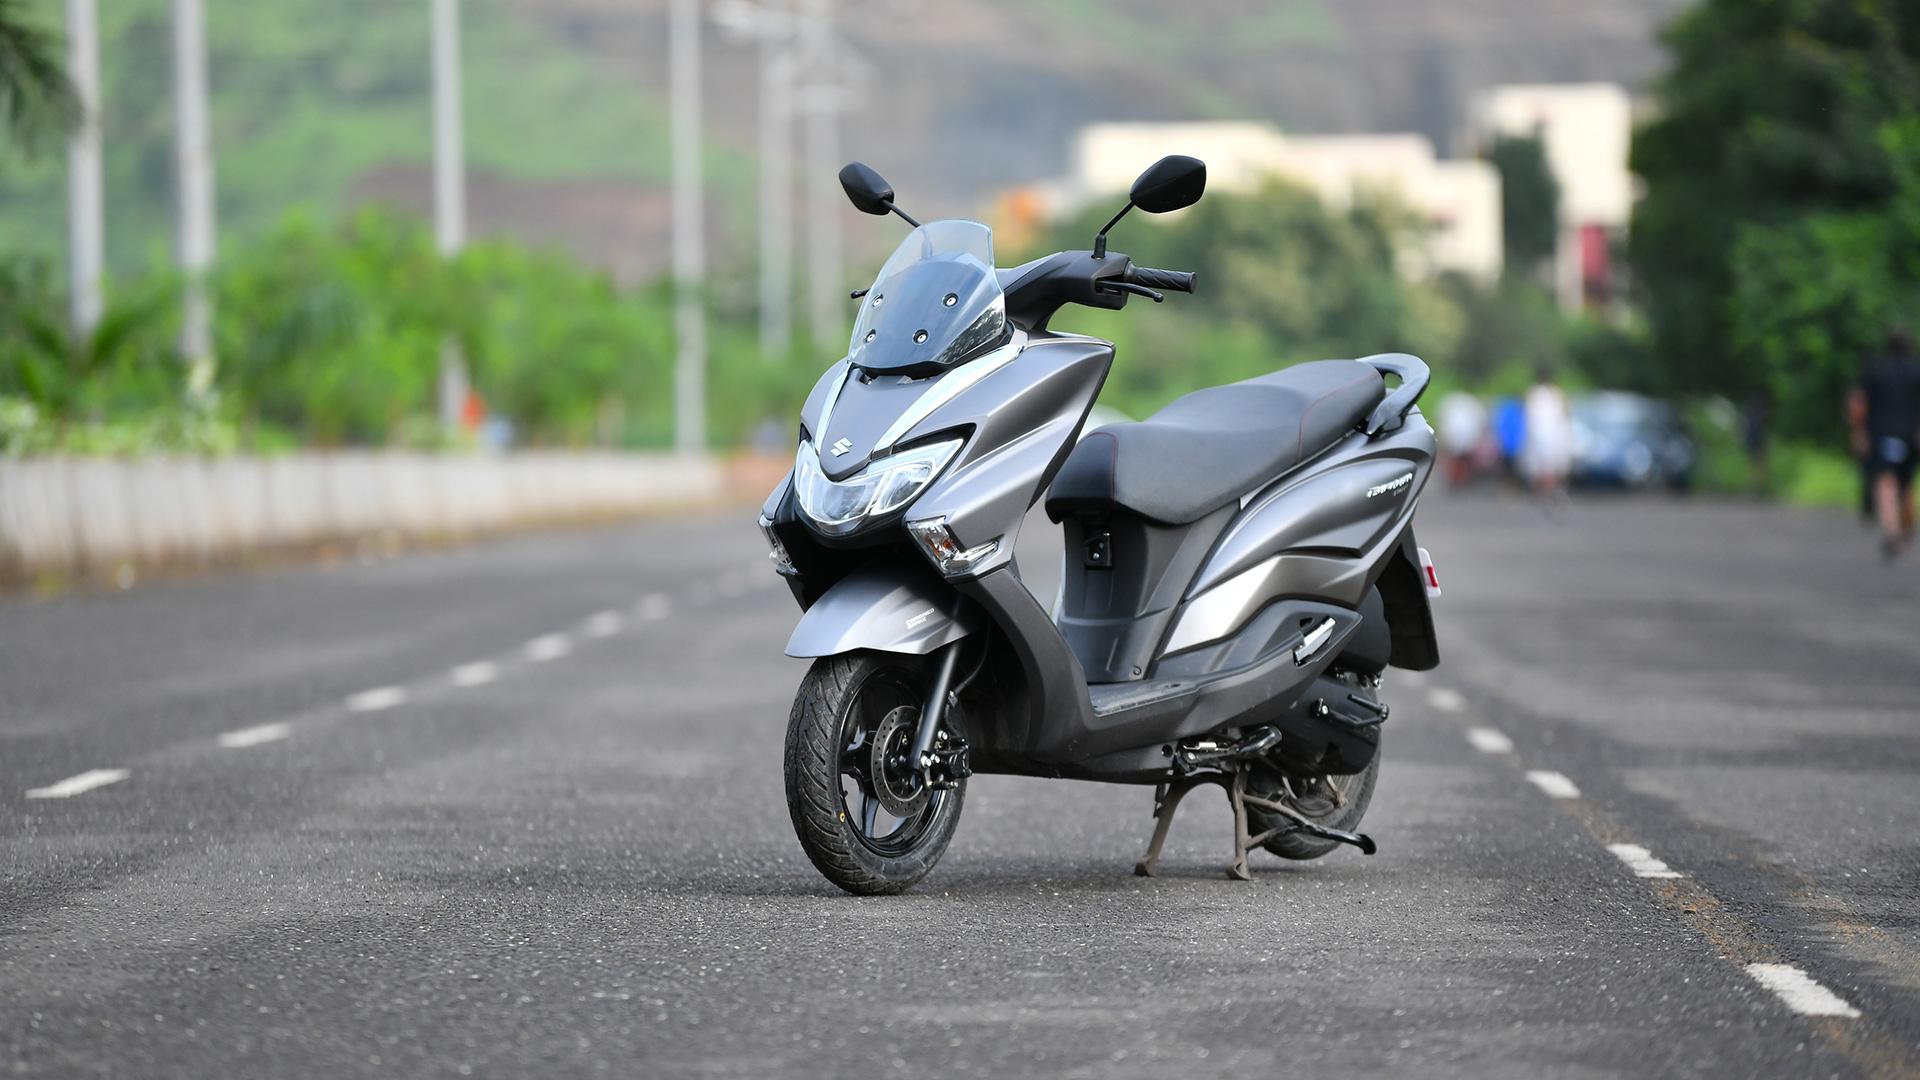 100 CC Motor Modelleri | Motosiklet Sitesi